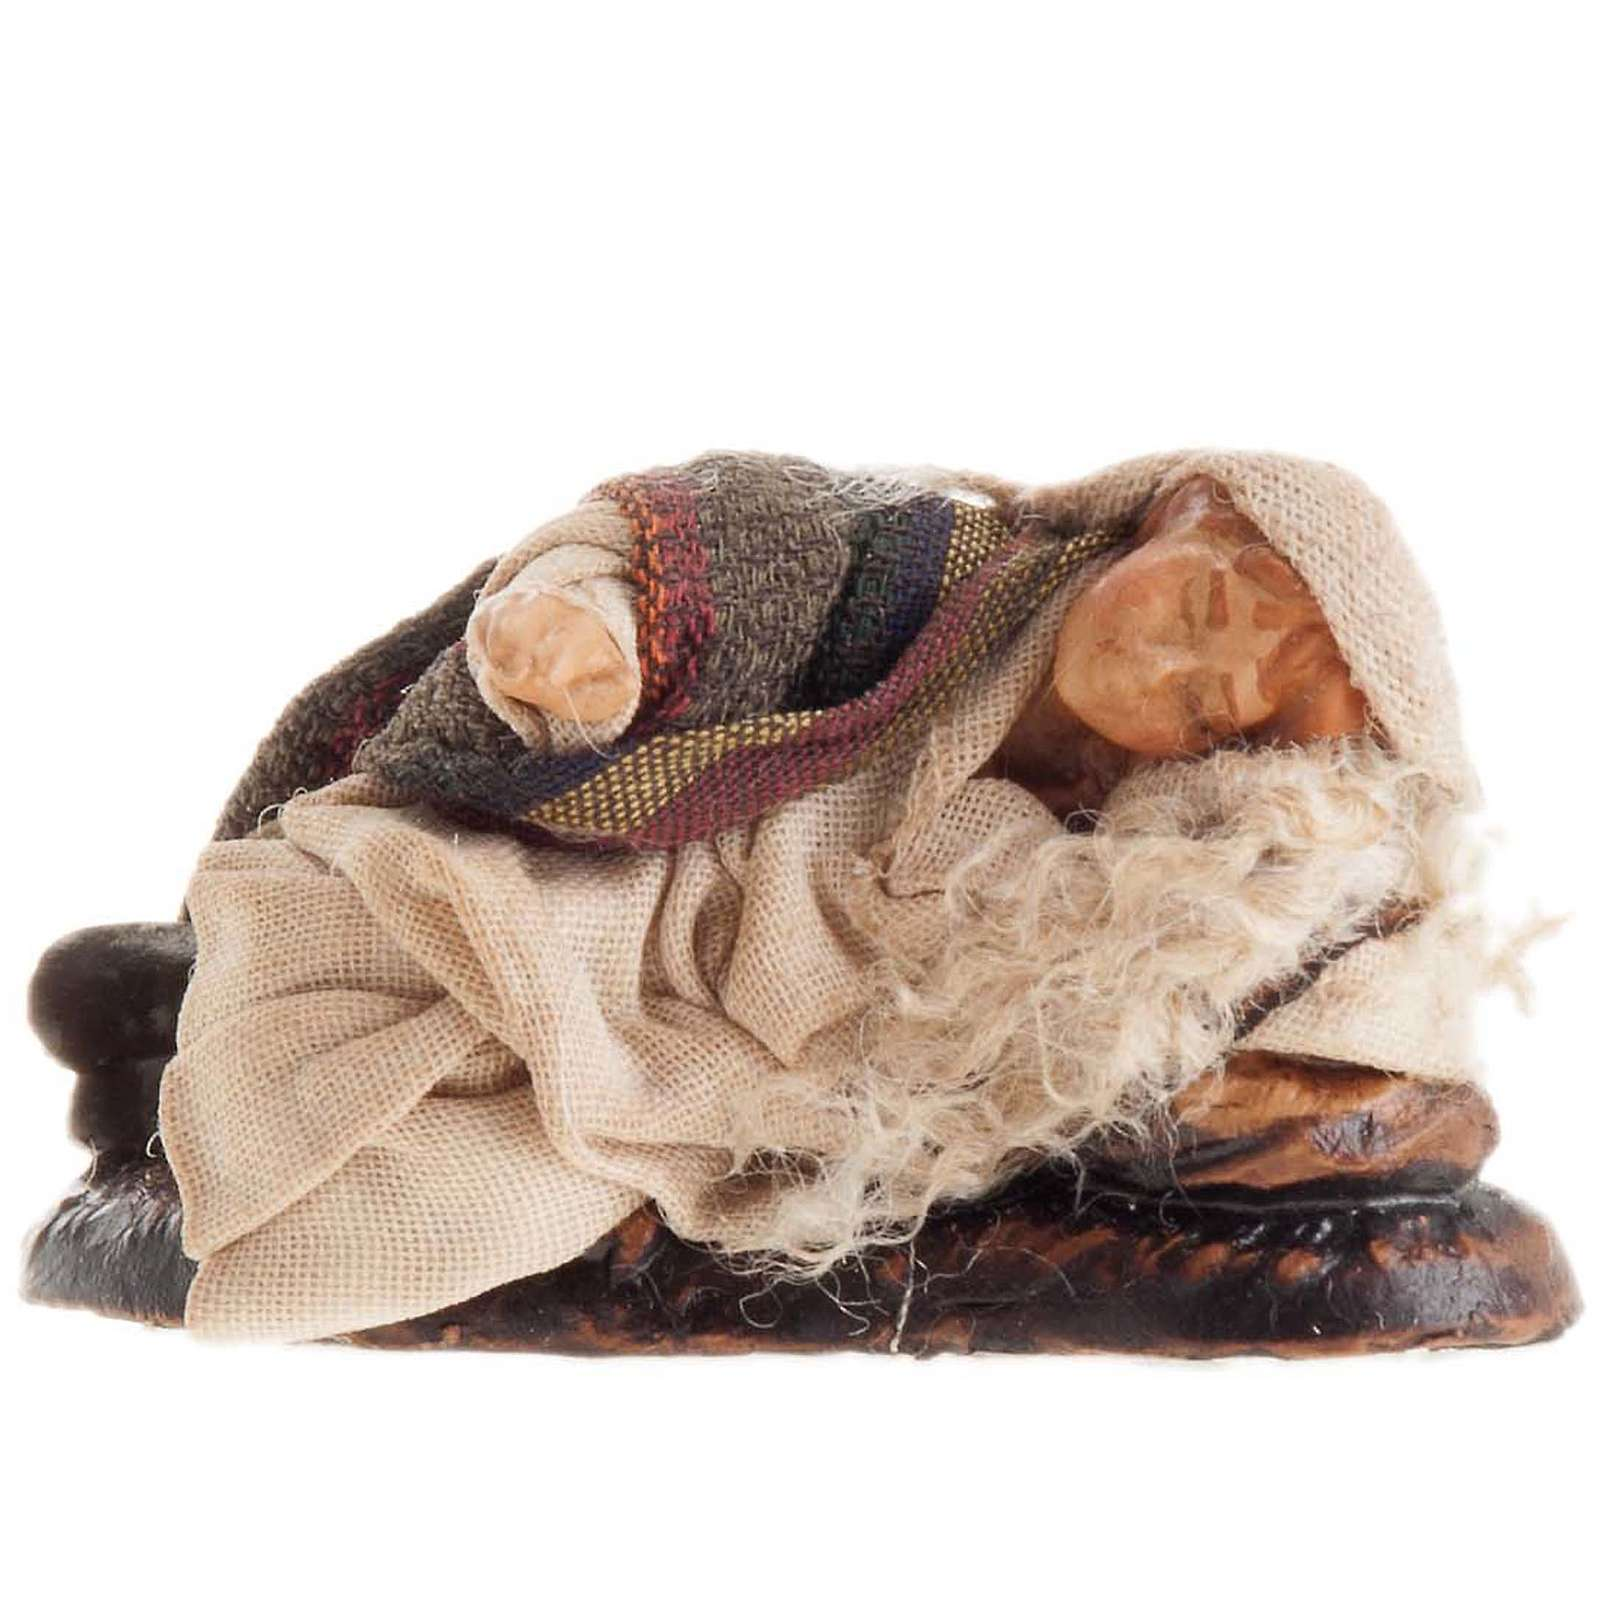 Neapolitan Nativity figurine, Sleeping man 8cm 4